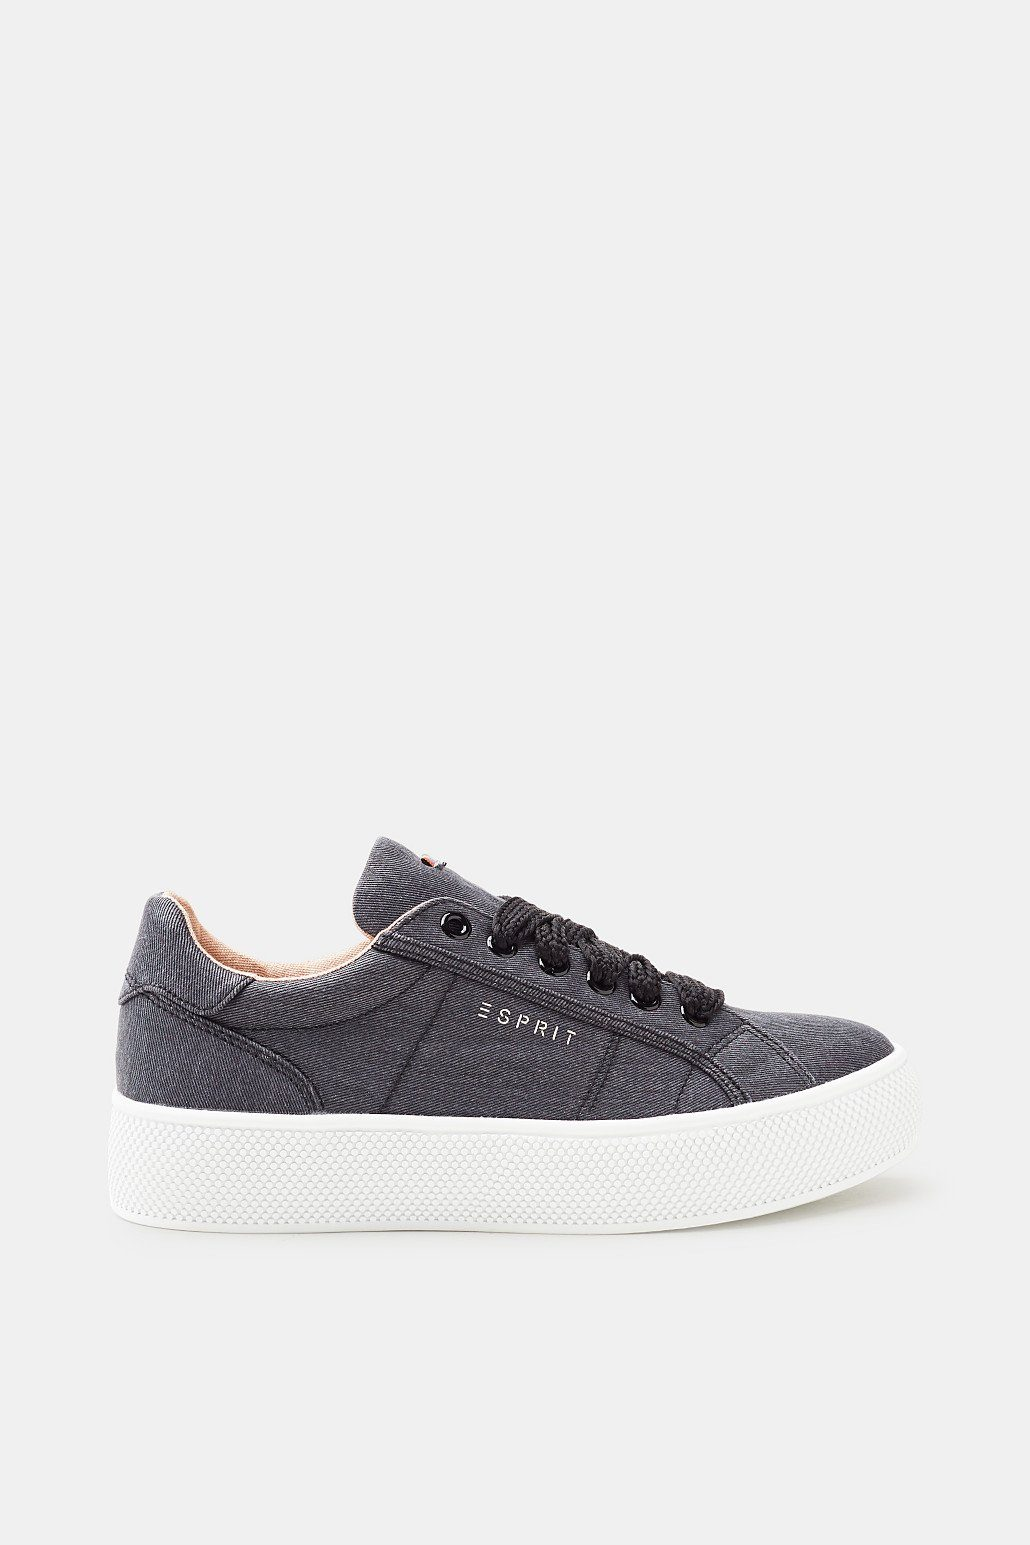 ESPRIT Plateau-Sneaker in Denim-Optik kaufen  BLACK